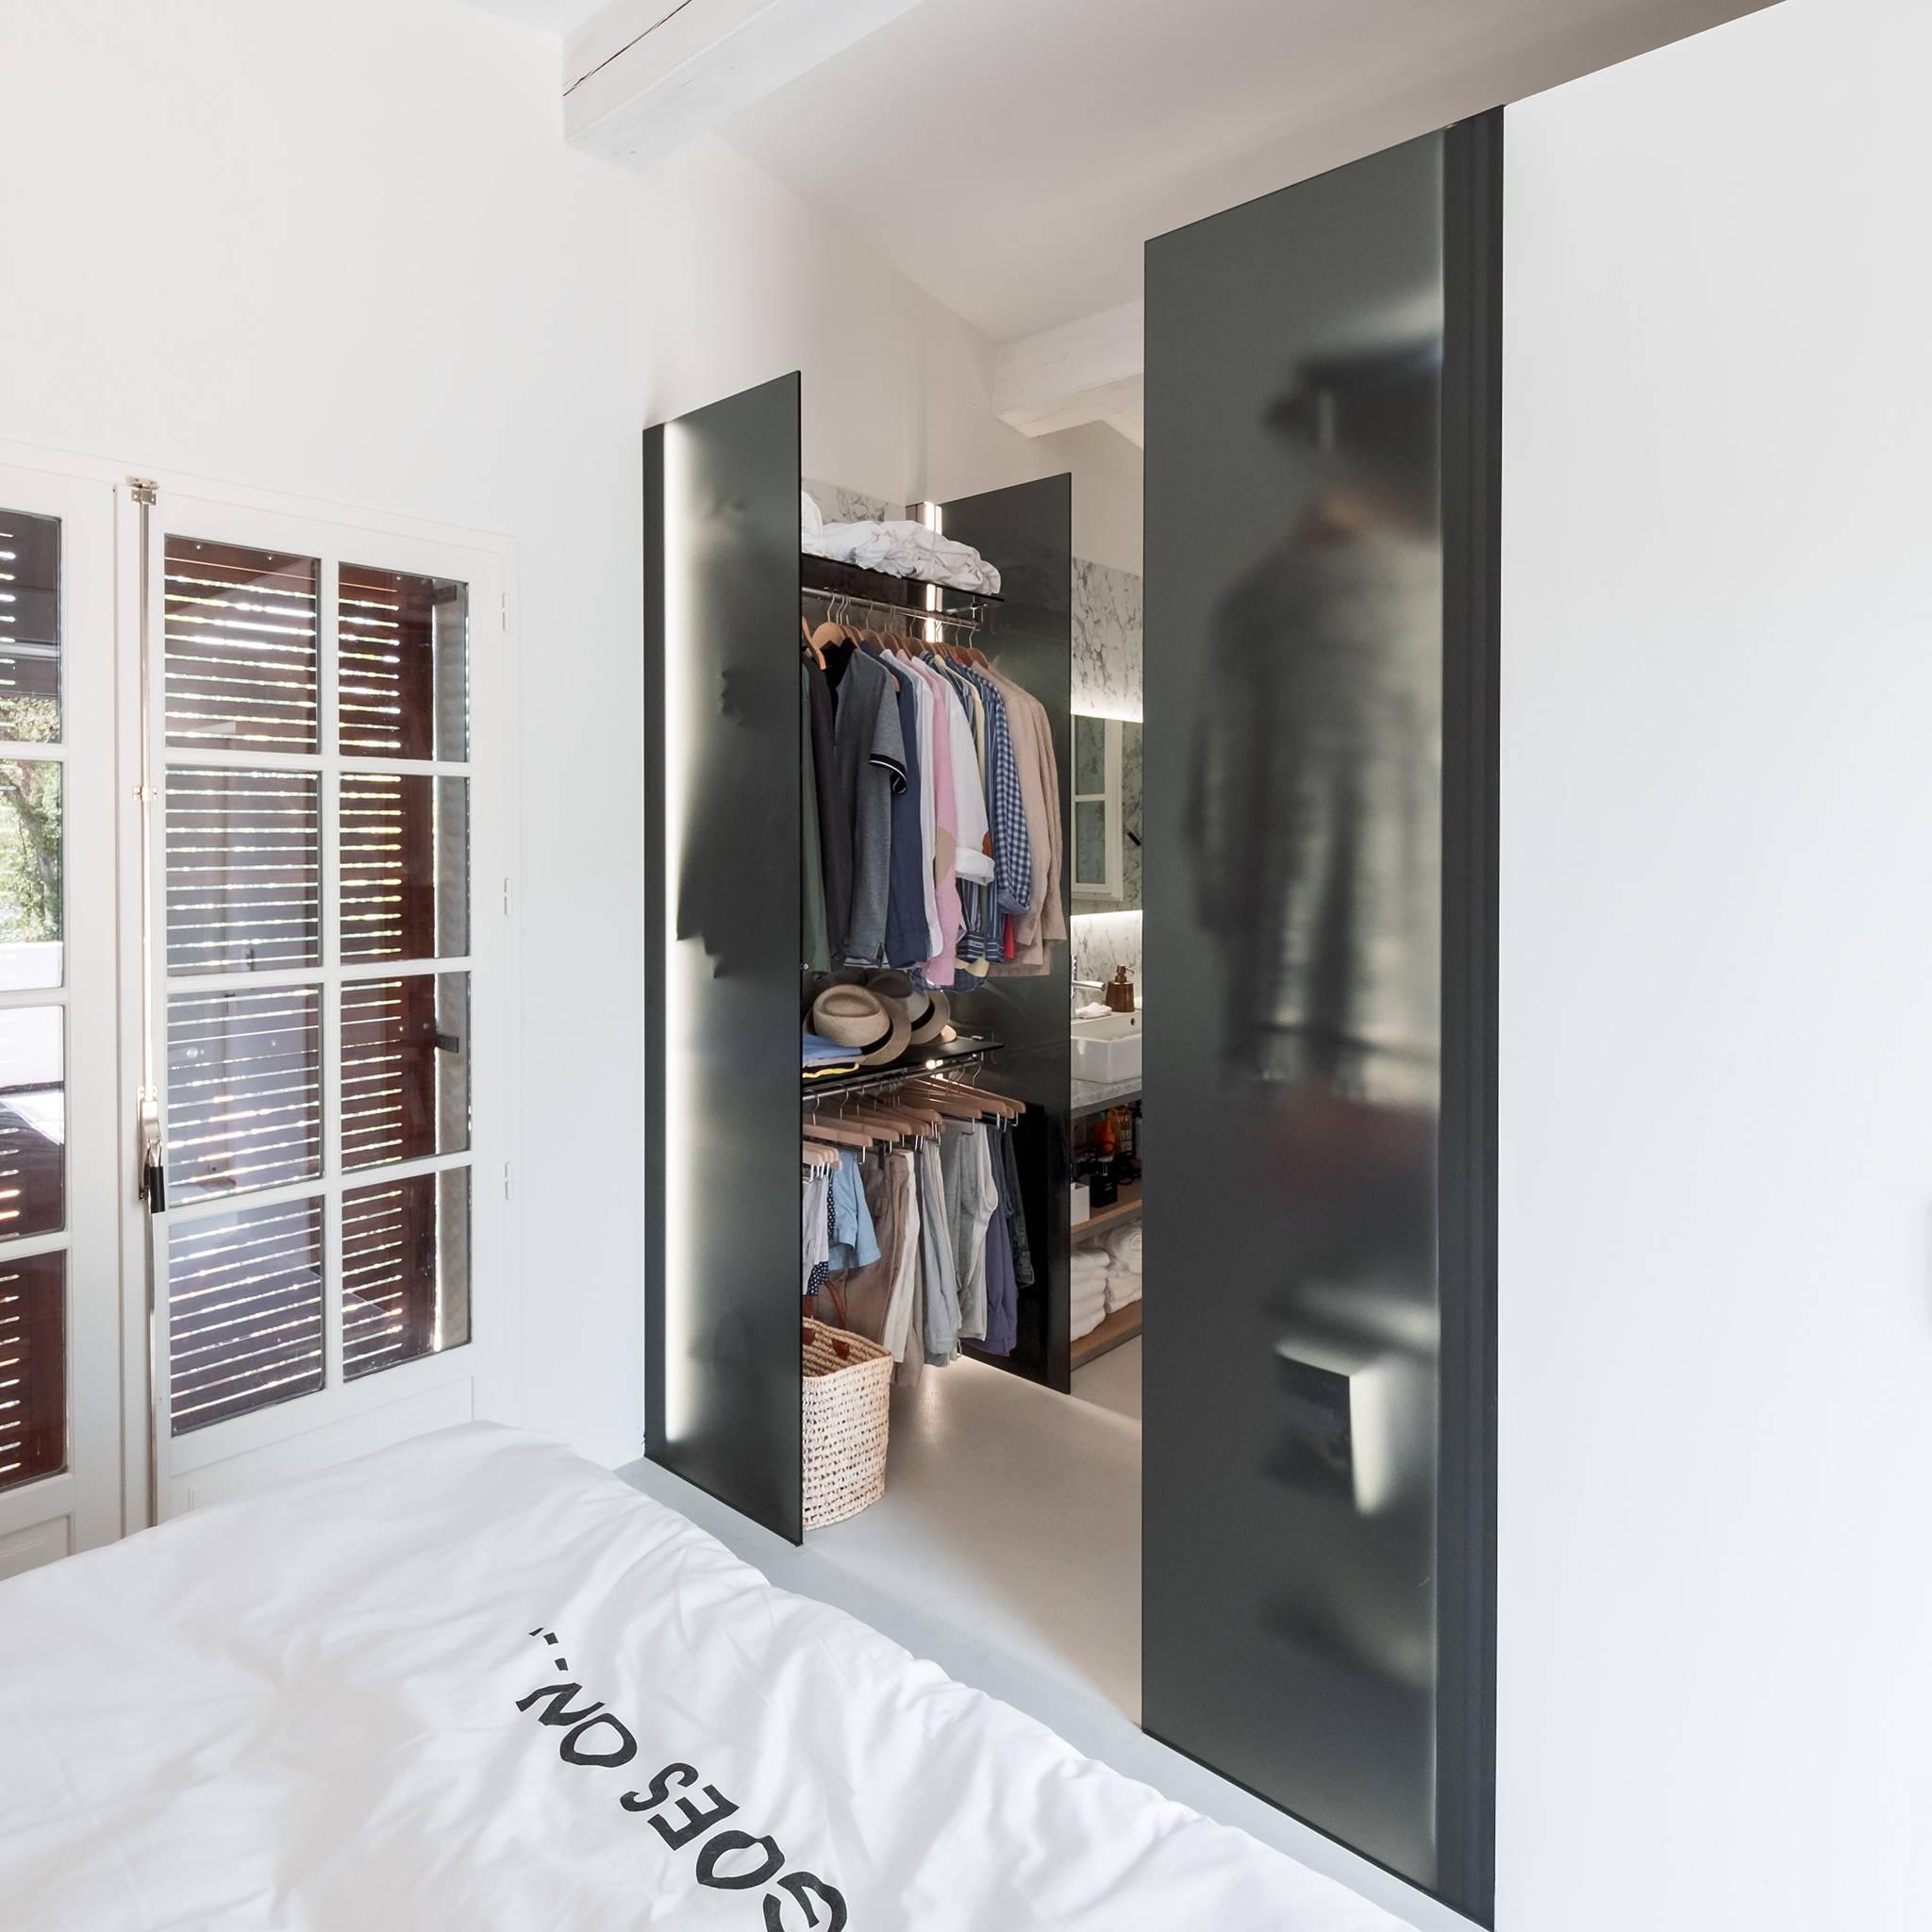 Walk-in closet with glass arrangements